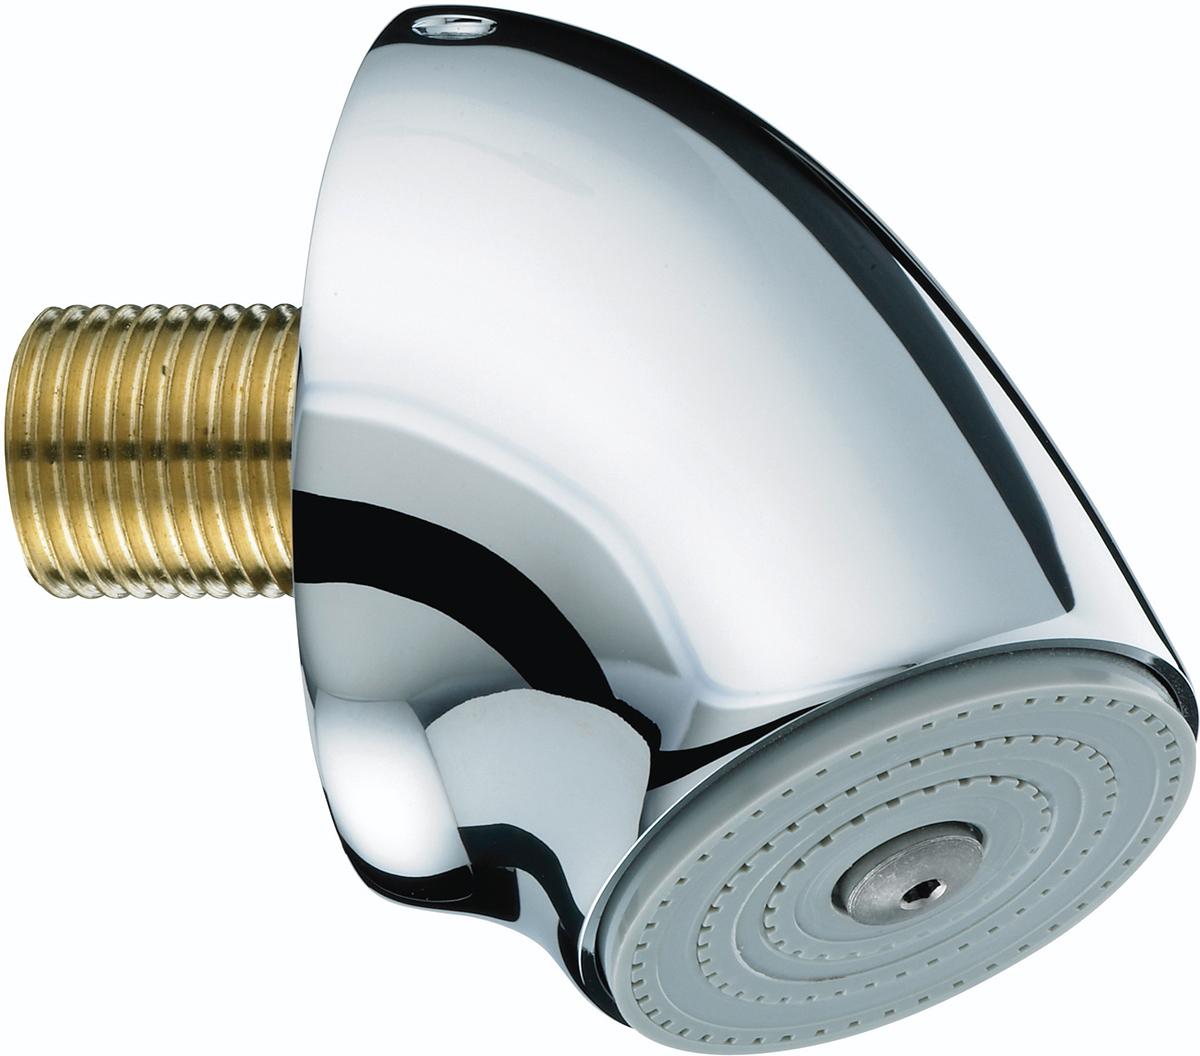 Vandal Resistant Adjustable Fast Fit Duct Showerhead